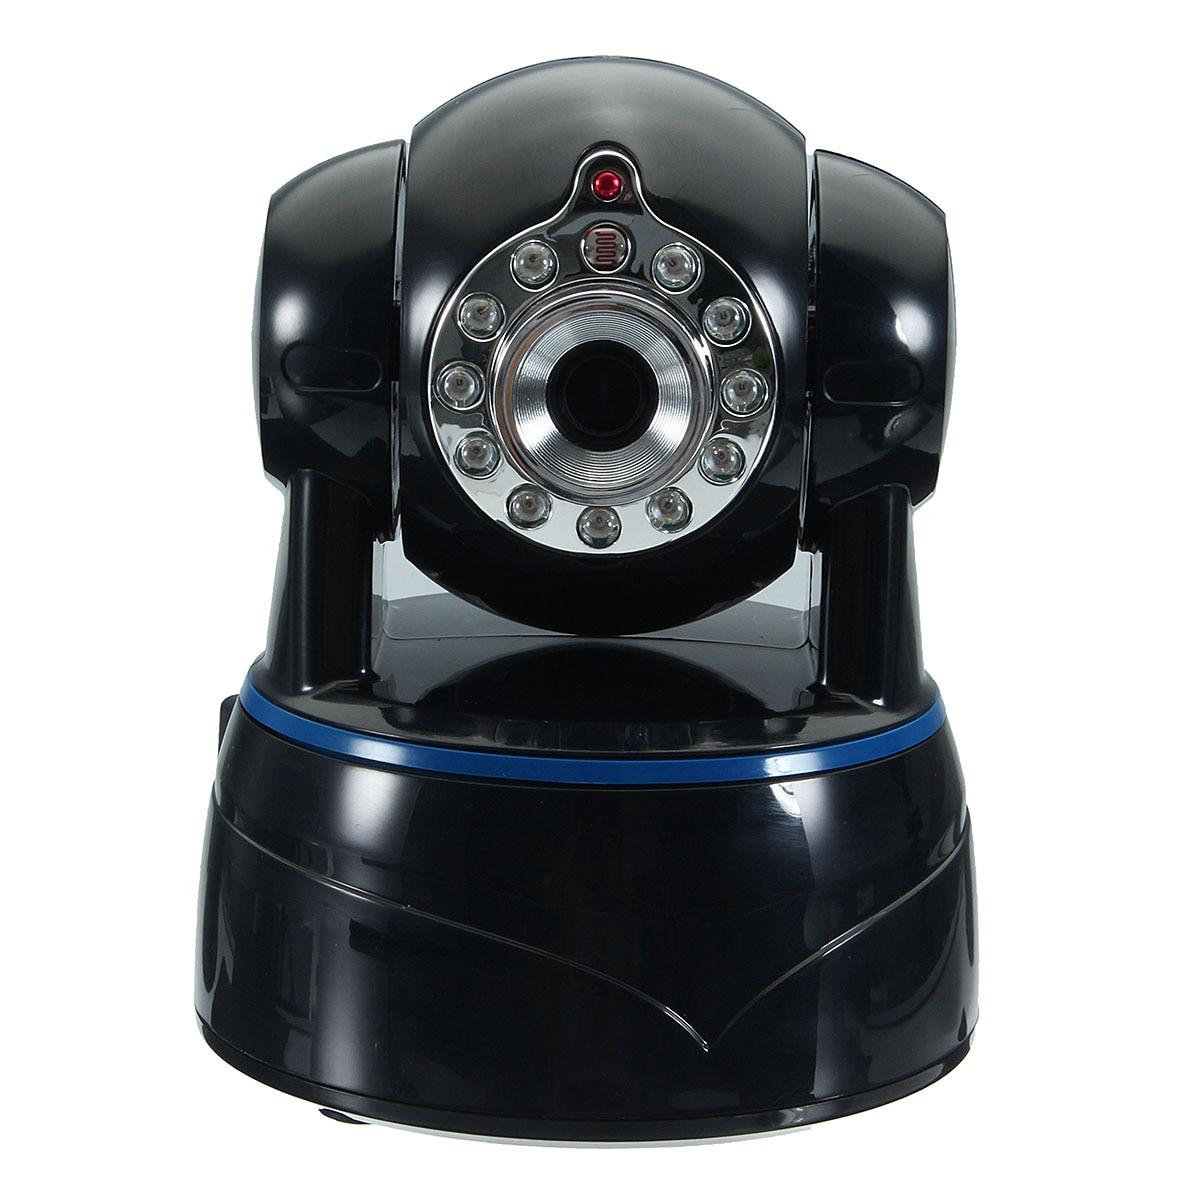 NEW Safurance Wireless 1080P Pan Tilt Network Security CCTV IP Camera Night Vision WiFi Webcam Home Safety Surveillance safurance mini wireless network wifi ip camera security nanny night vision cam surveillance home security